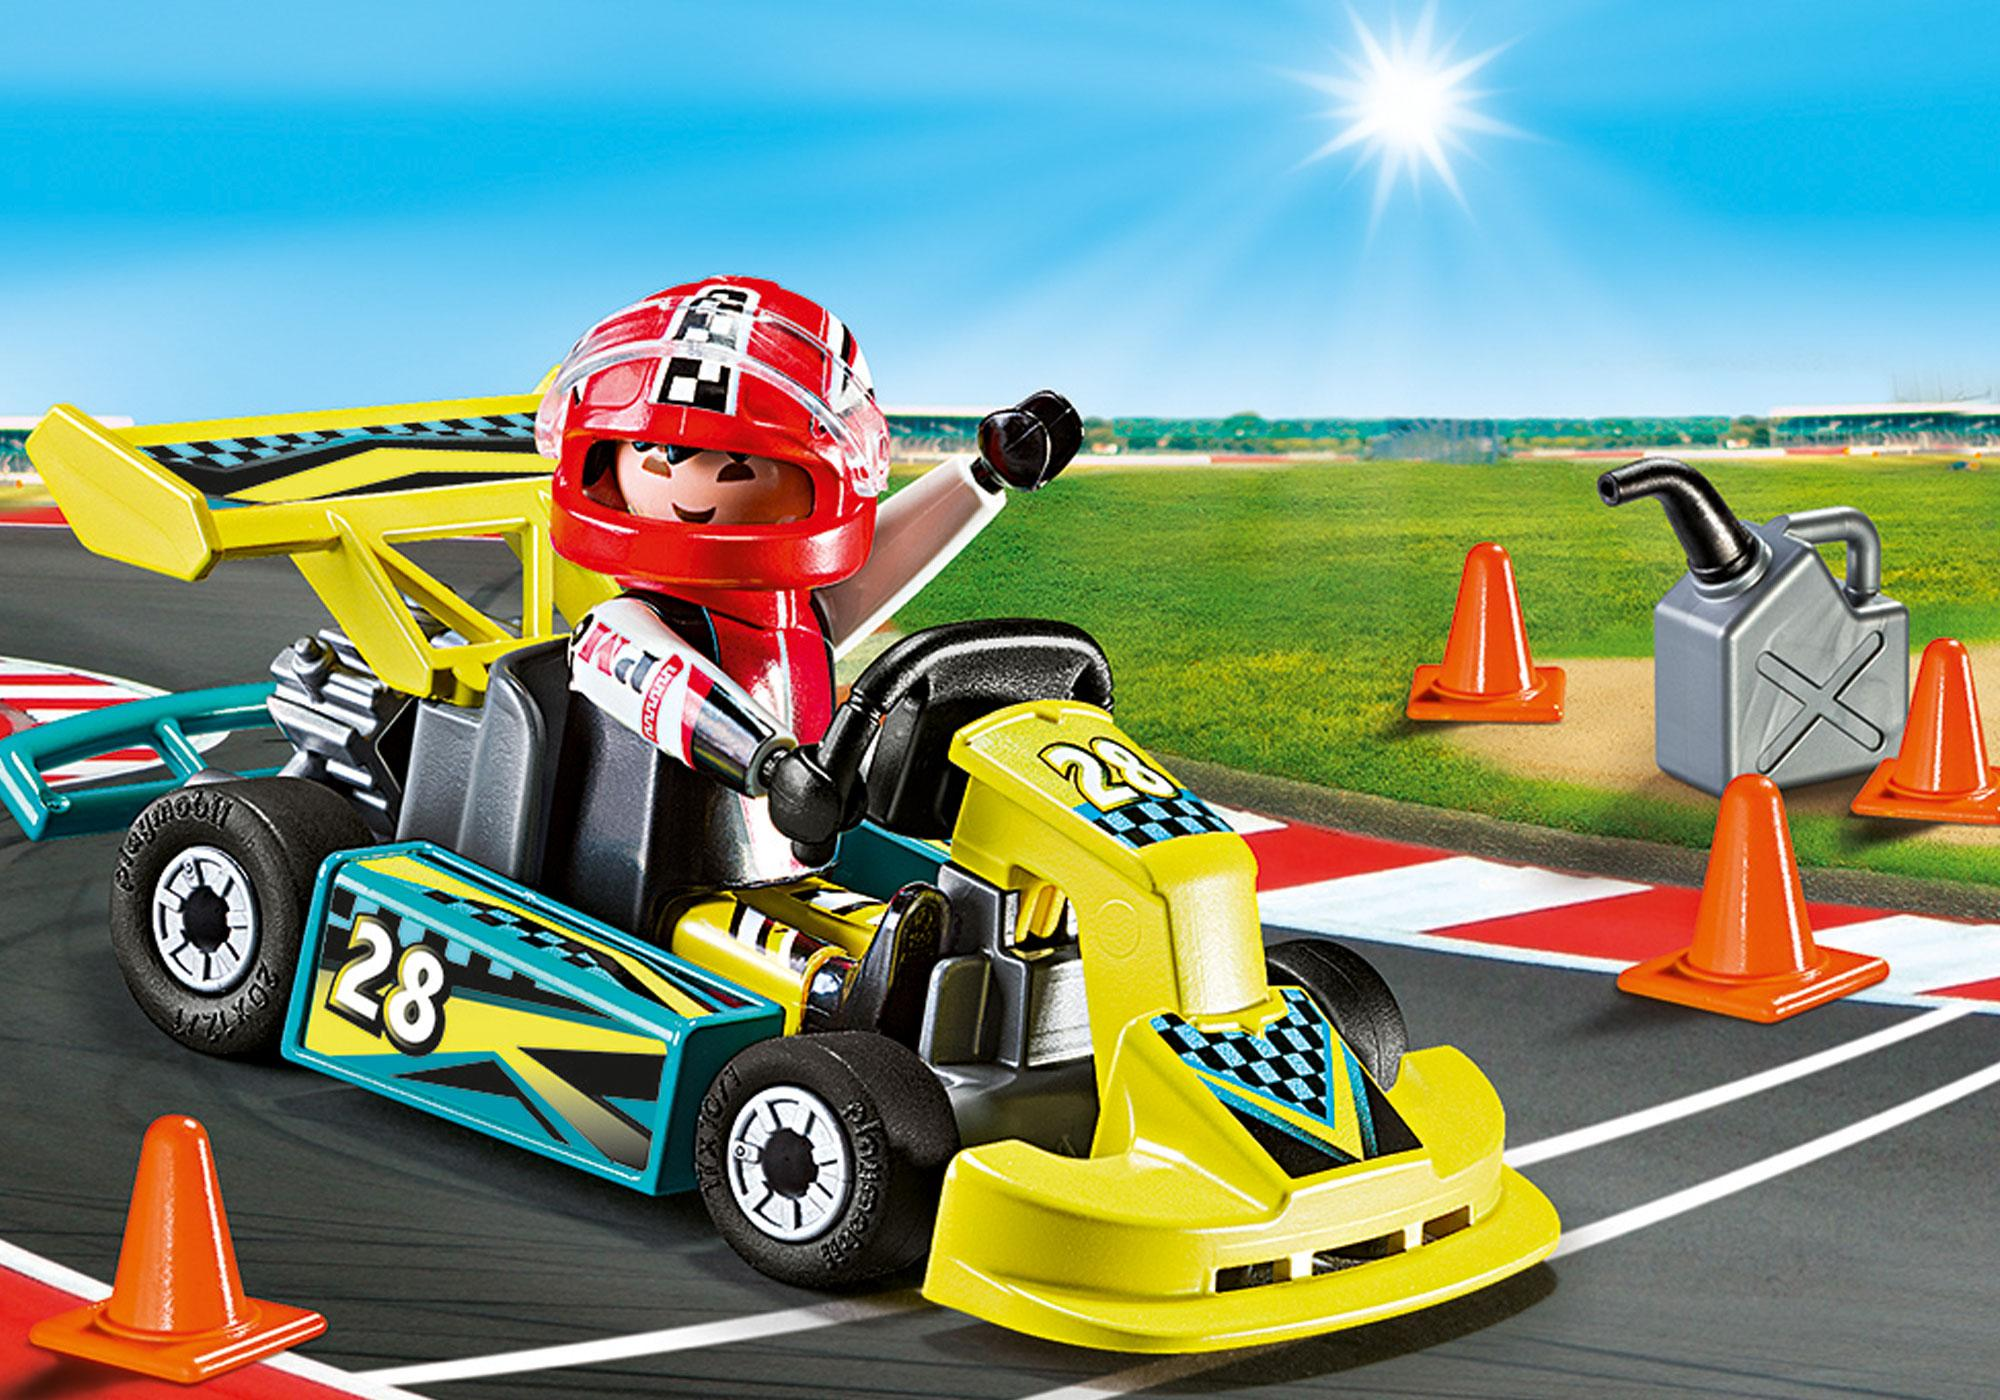 9322_product_detail/Go-Kart Racer Carry Case